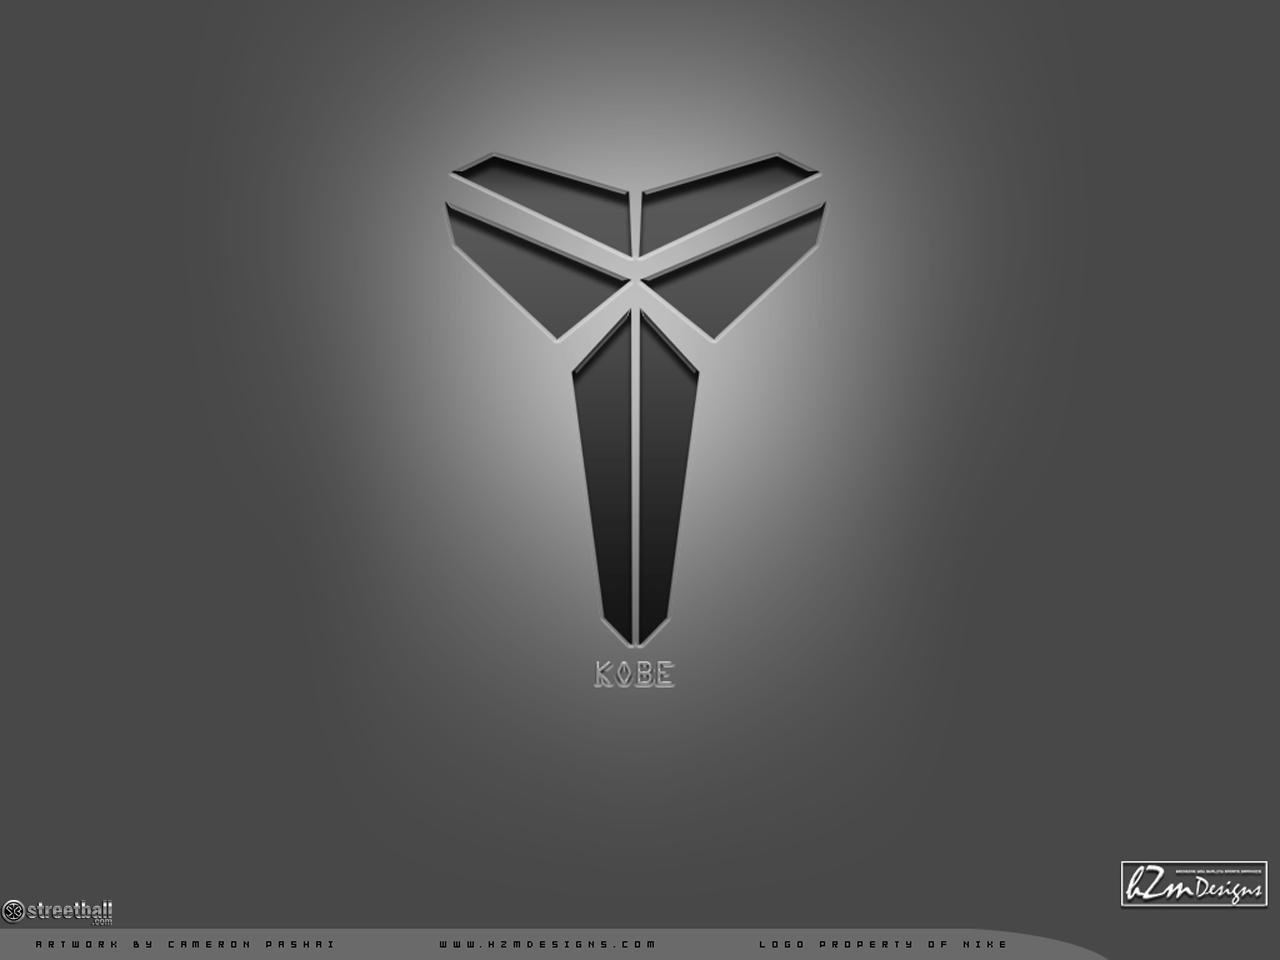 innovative design 2eff7 75e5f Nike Kobe W, papers, W, paper Cave